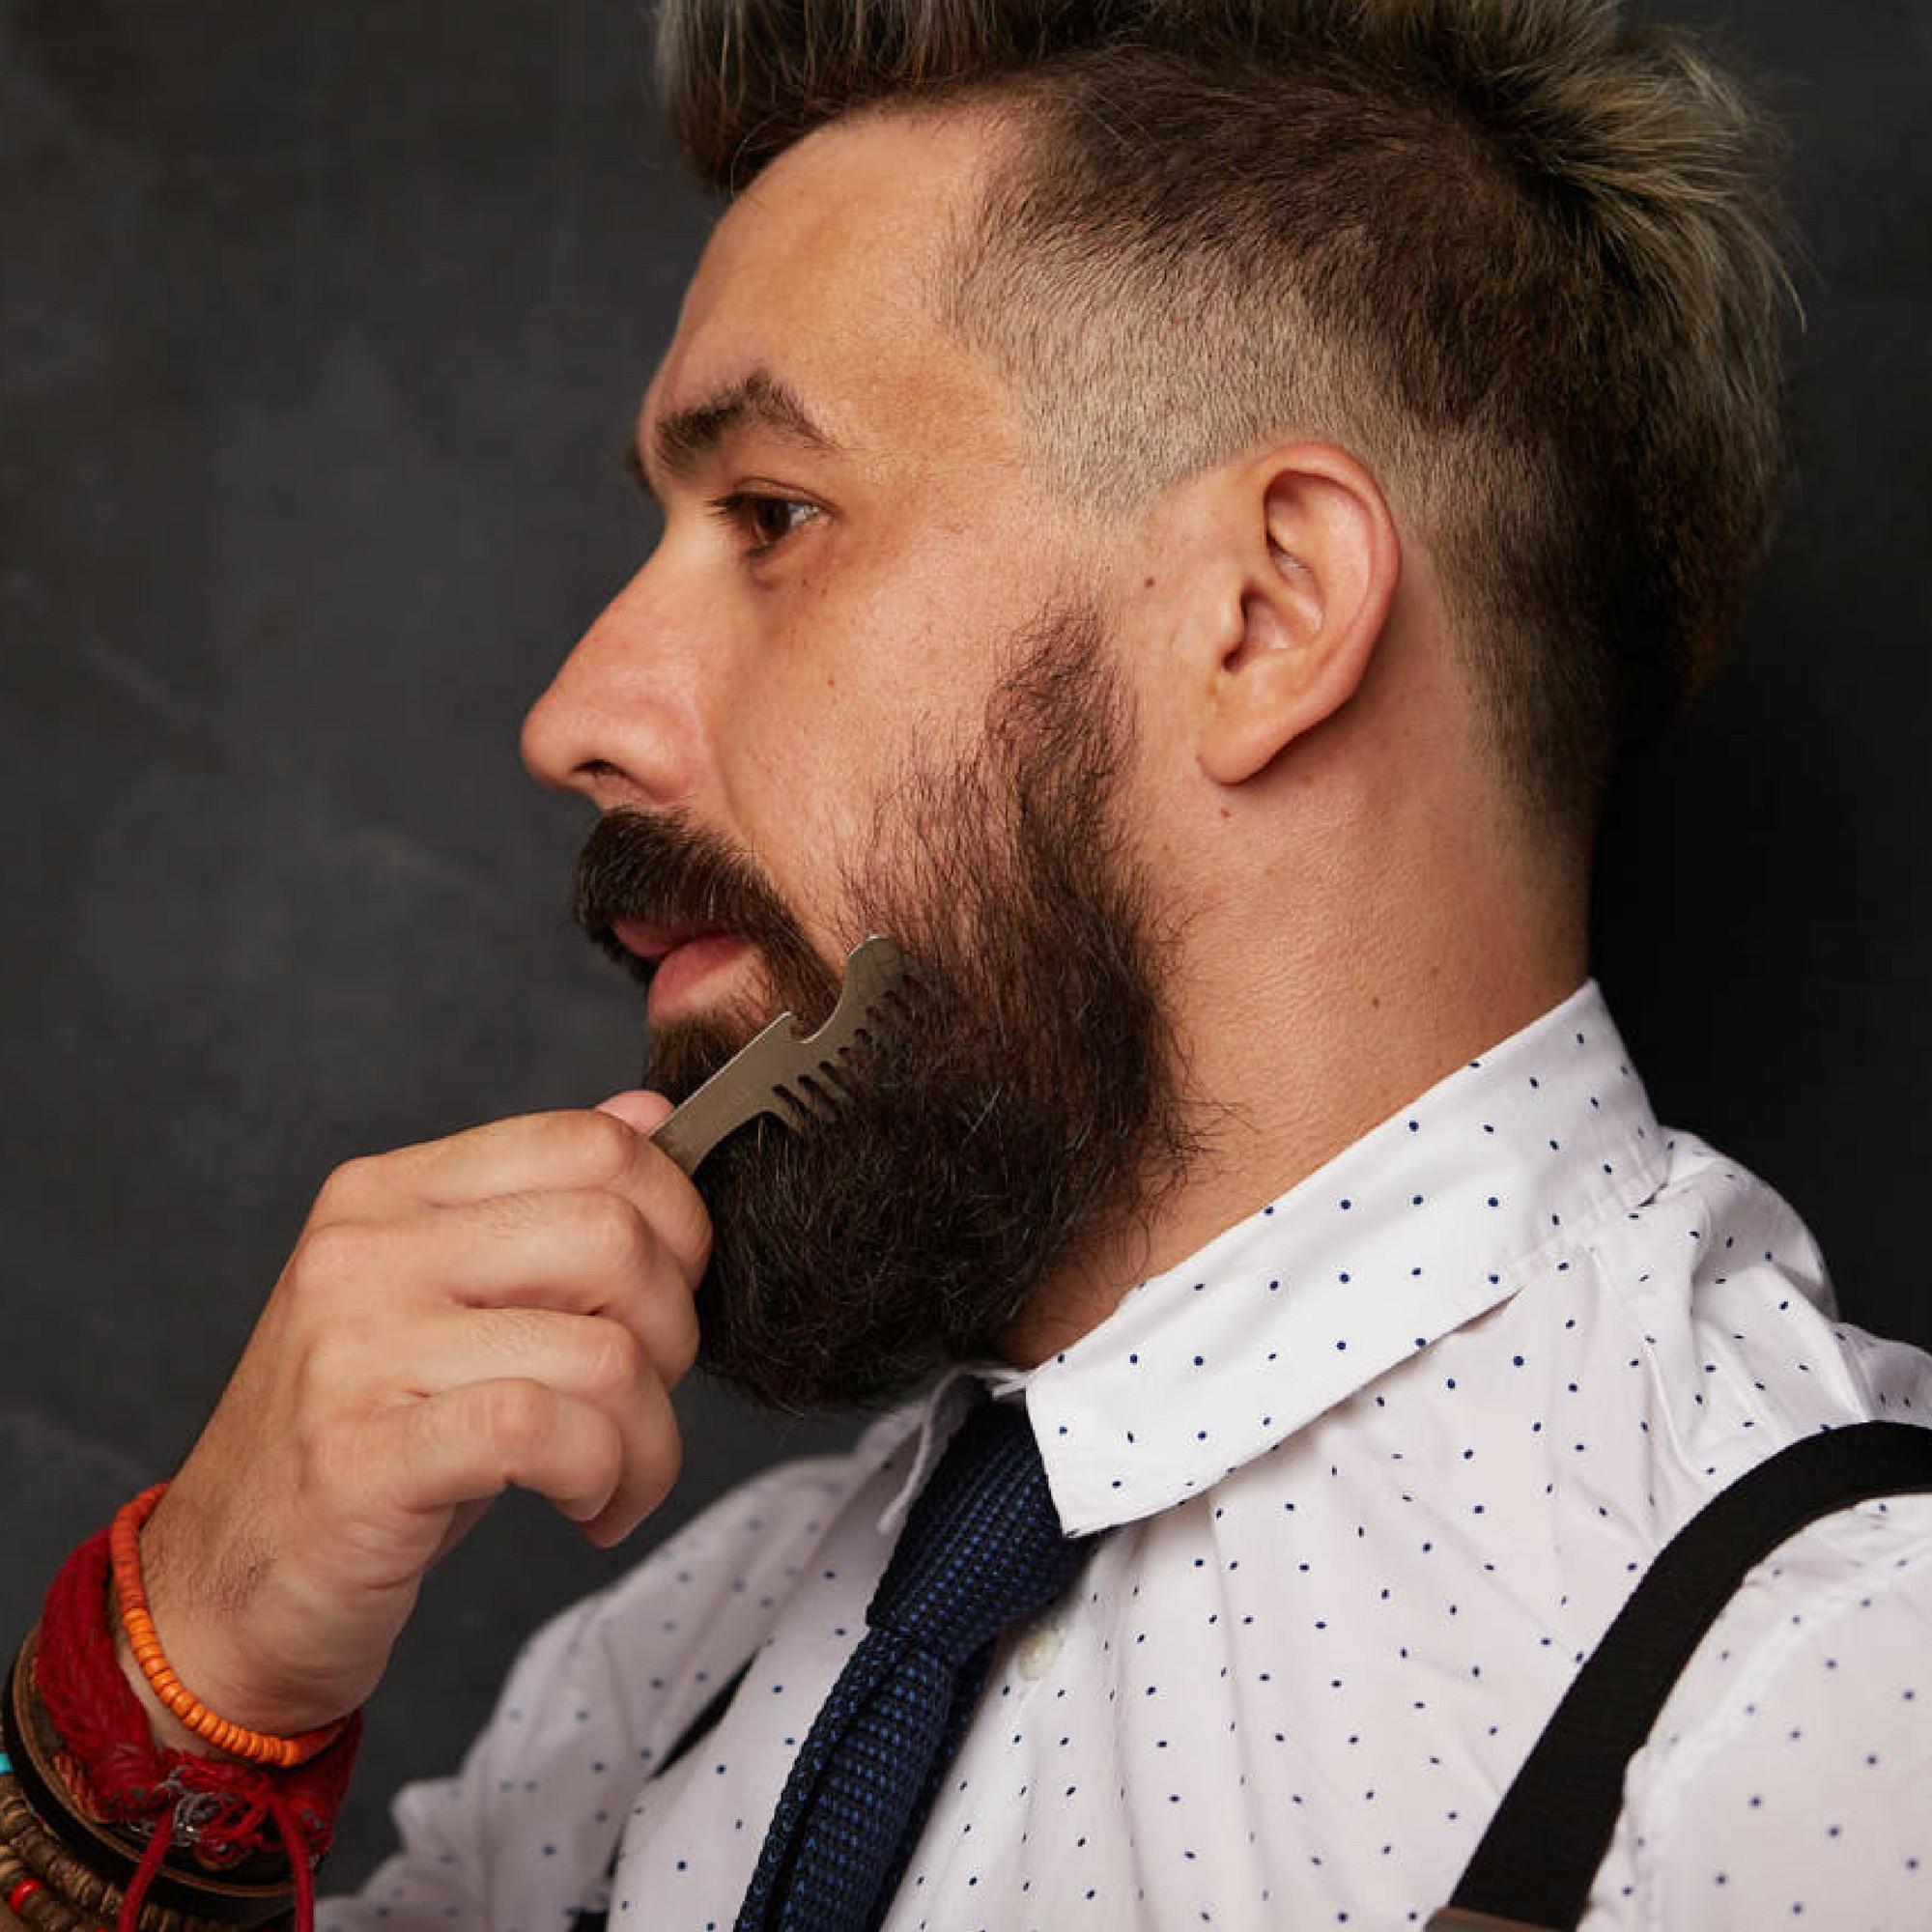 Intalnire gratuita pentru barba? i